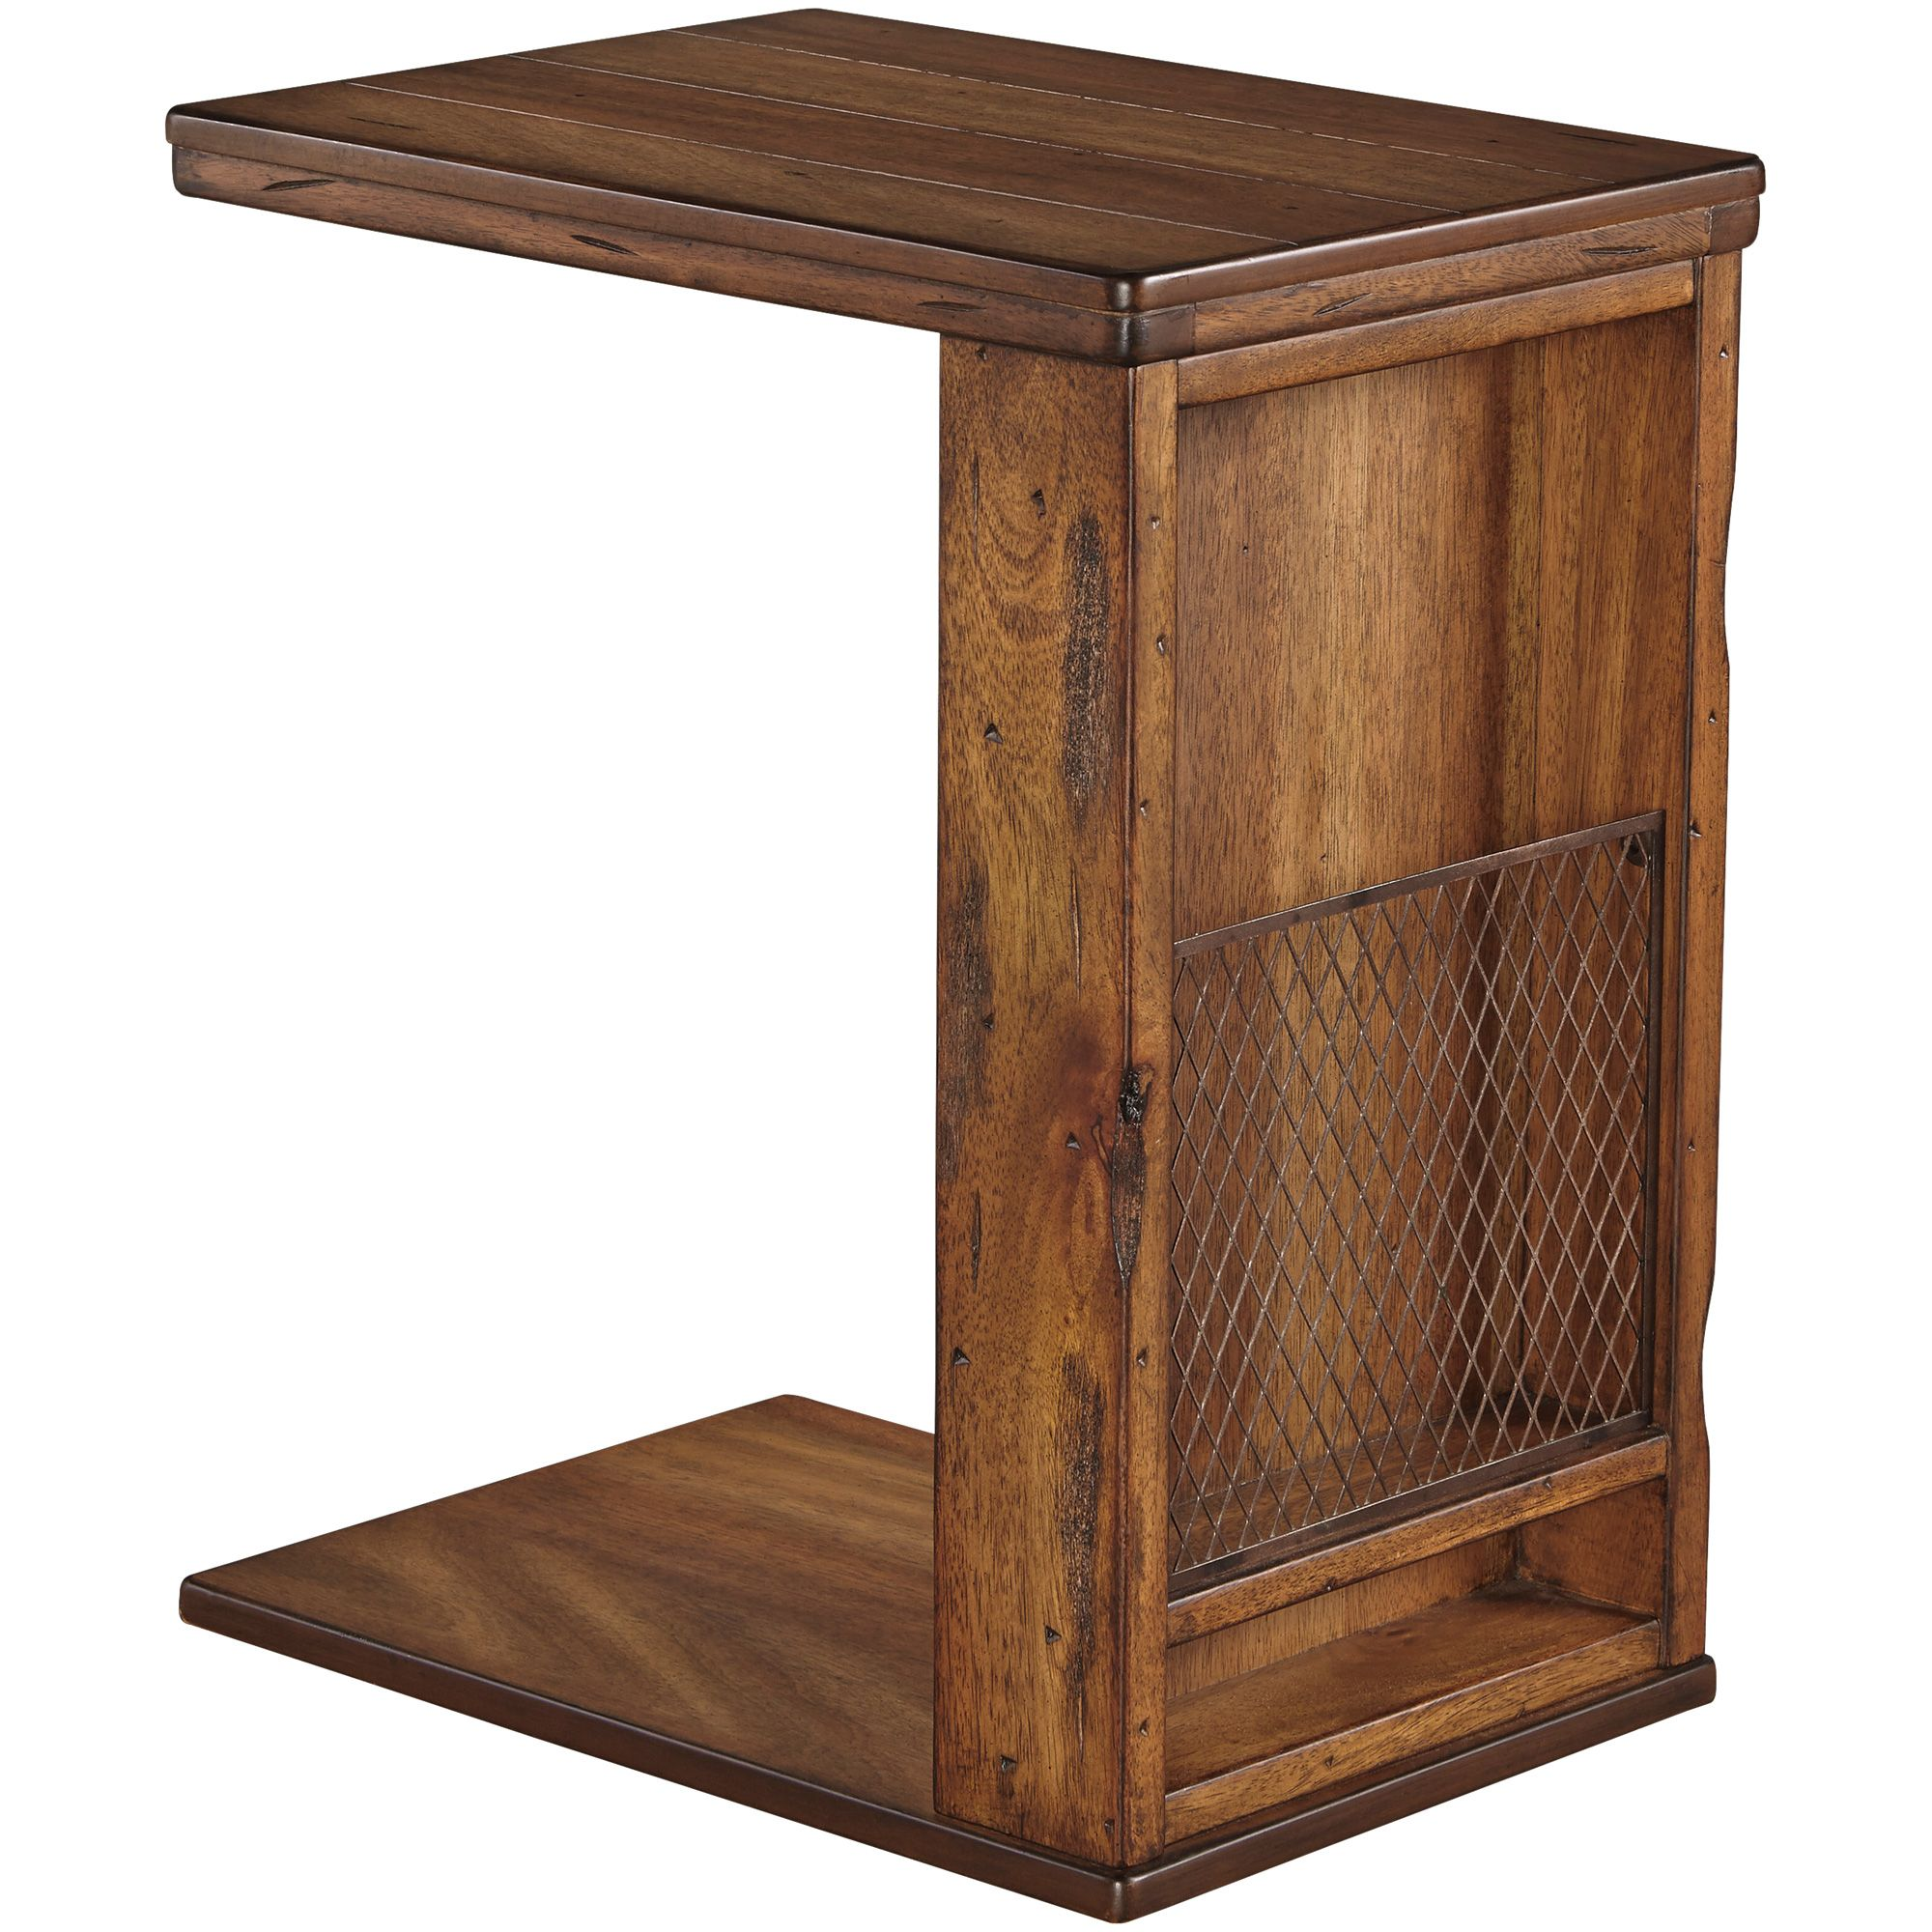 Tamonie Rustic Sofa Server Table Rustic Sofa Chair Side Table